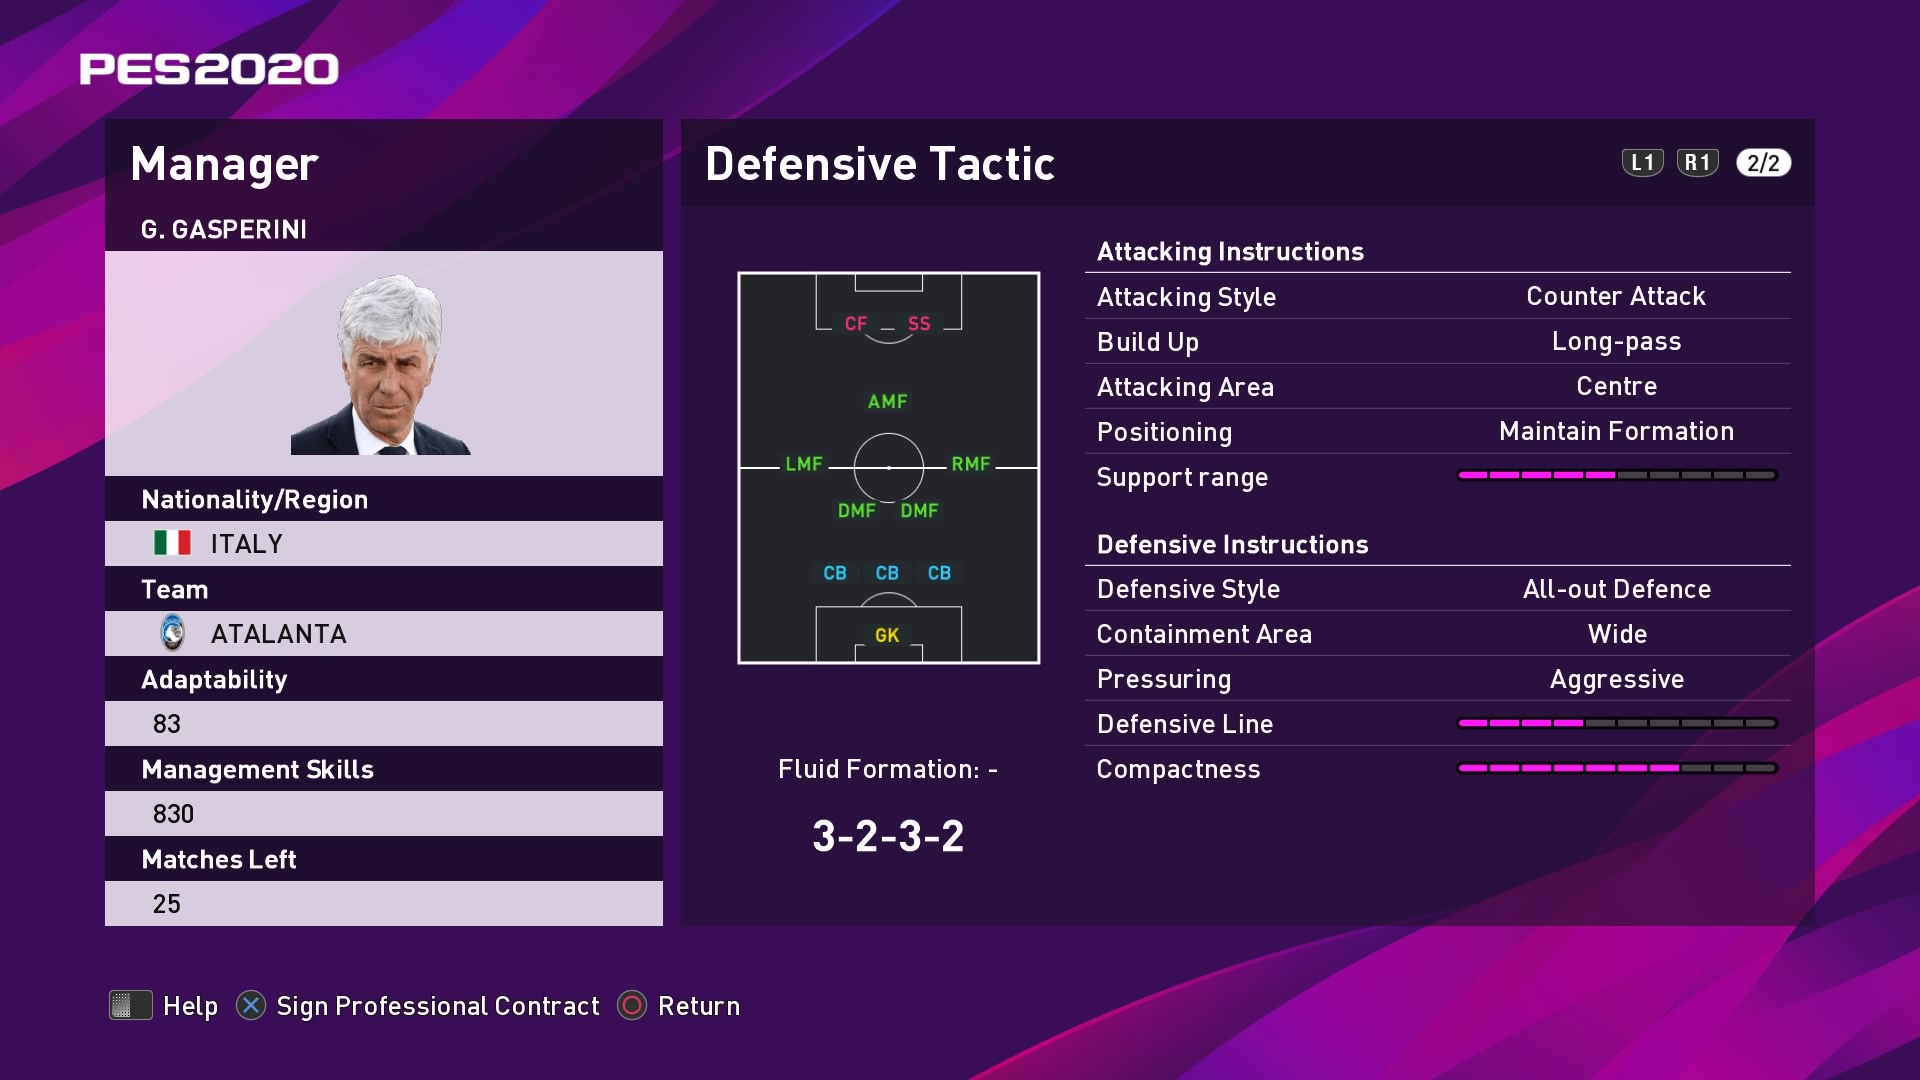 G. Gasperini (Gian Piero Gasperini) Defensive Tactic in PES 2020 myClub